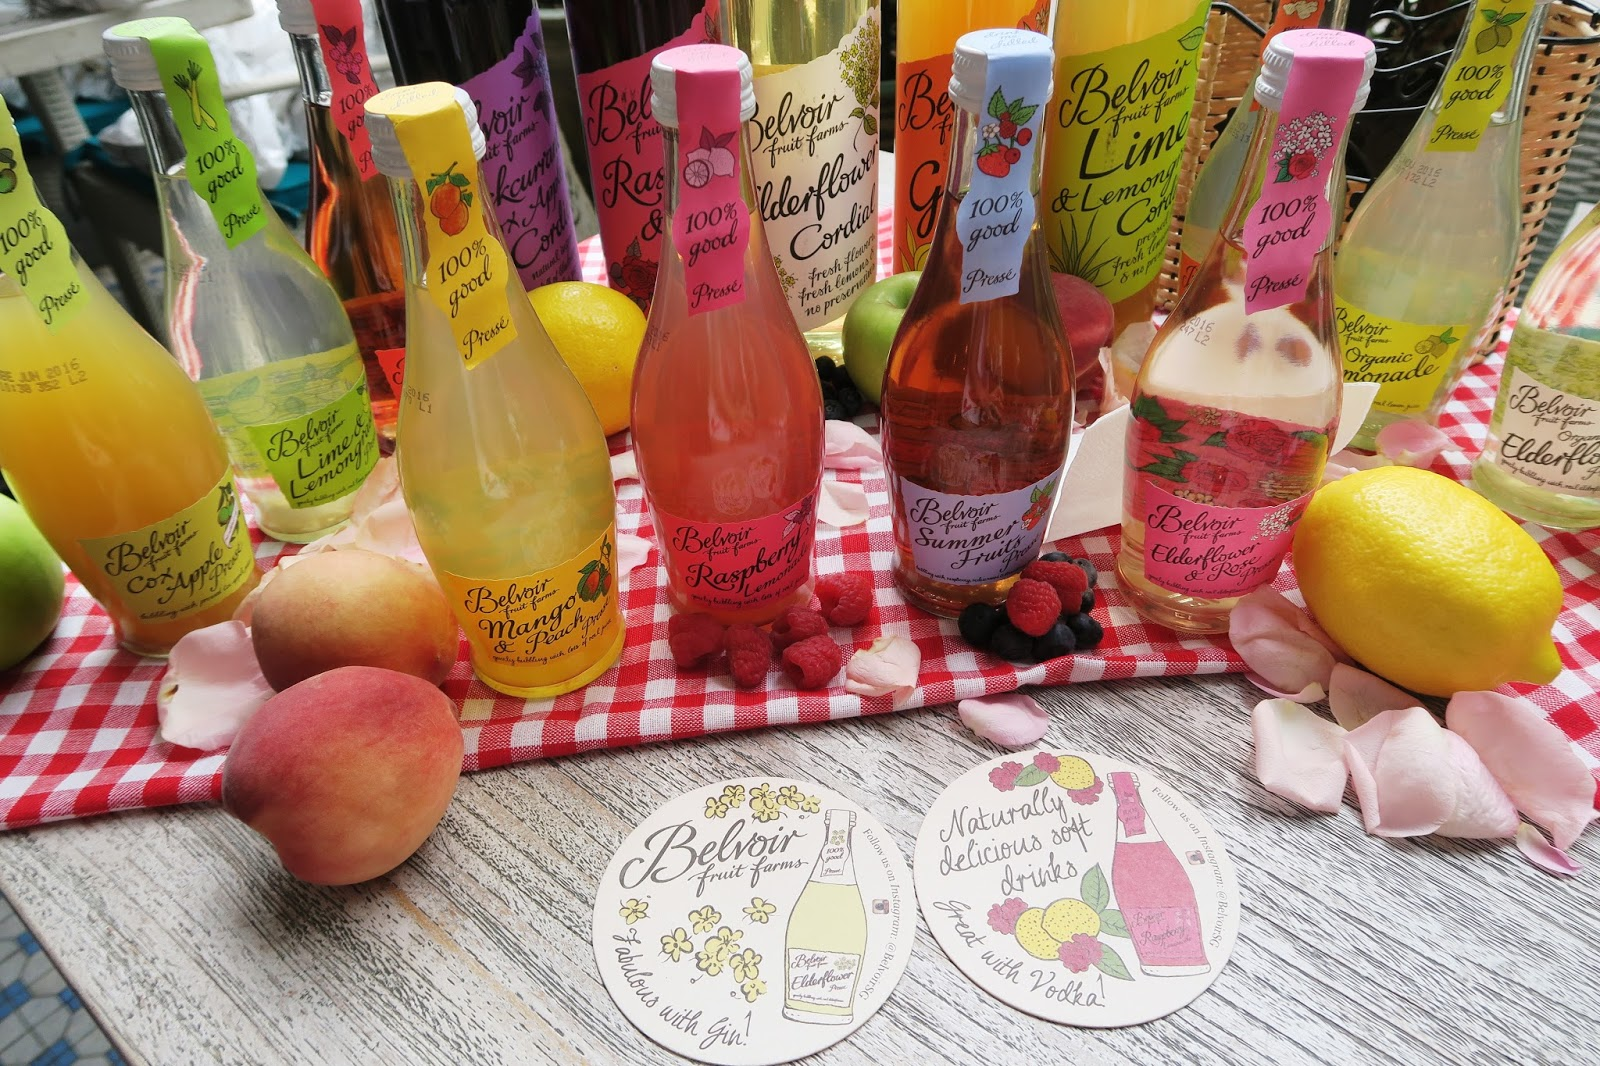 mixon fruit farms fruits for healthy heart